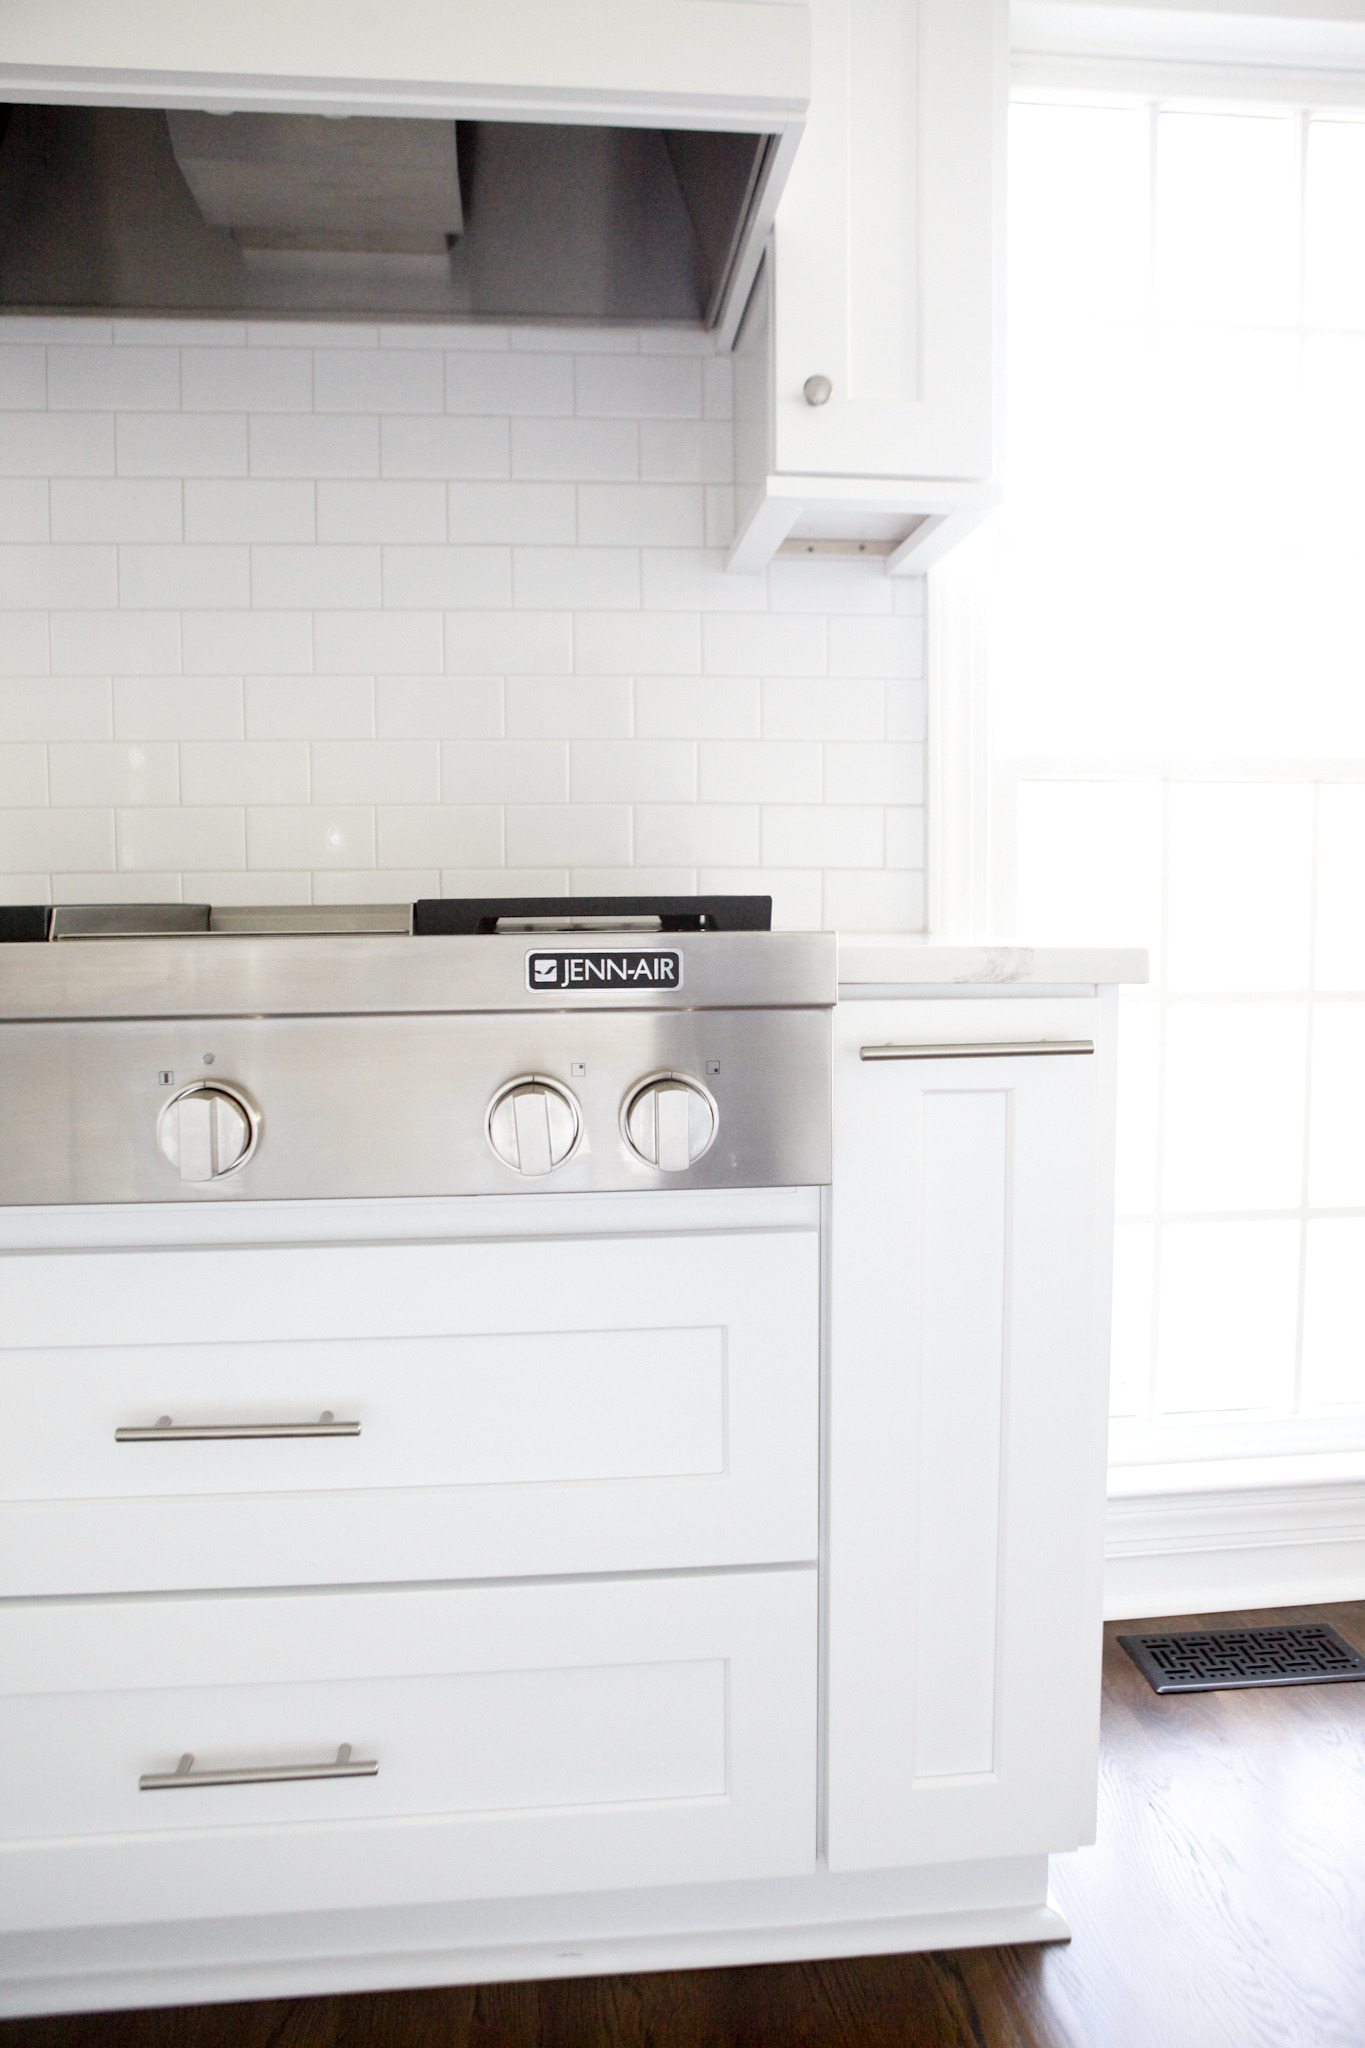 jenn-air stove top